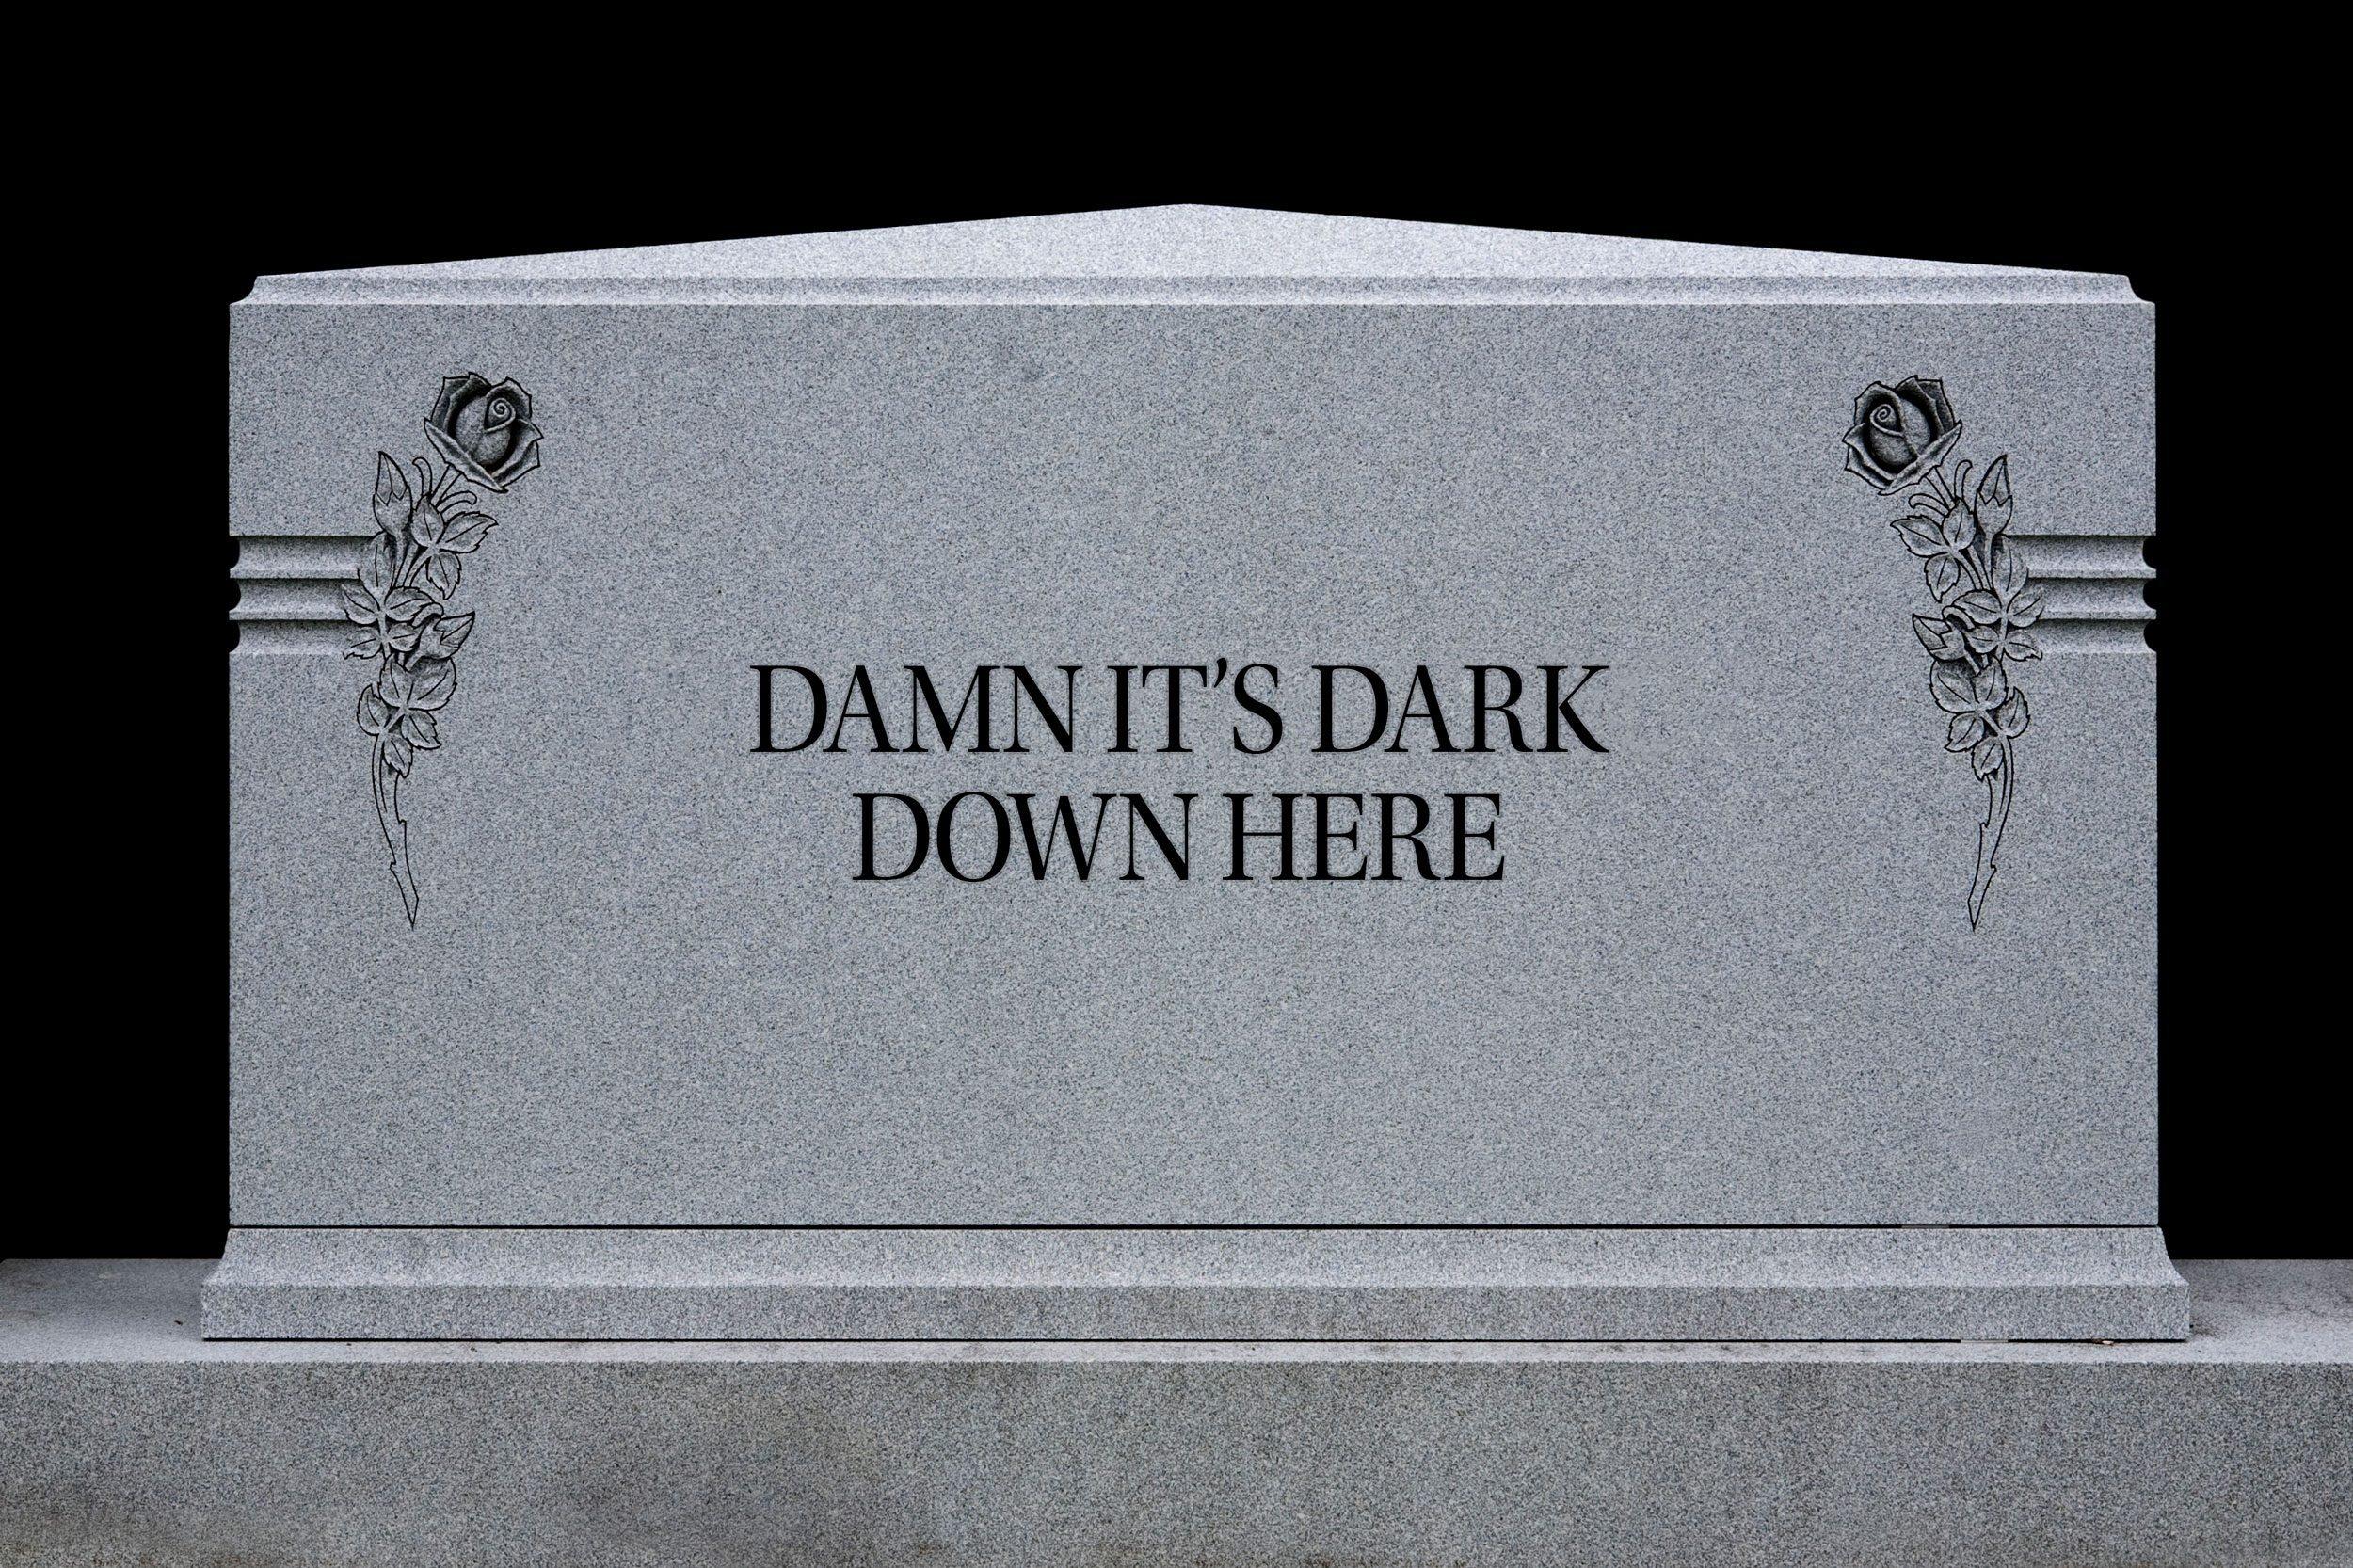 tombstone: Damn it's dark down here